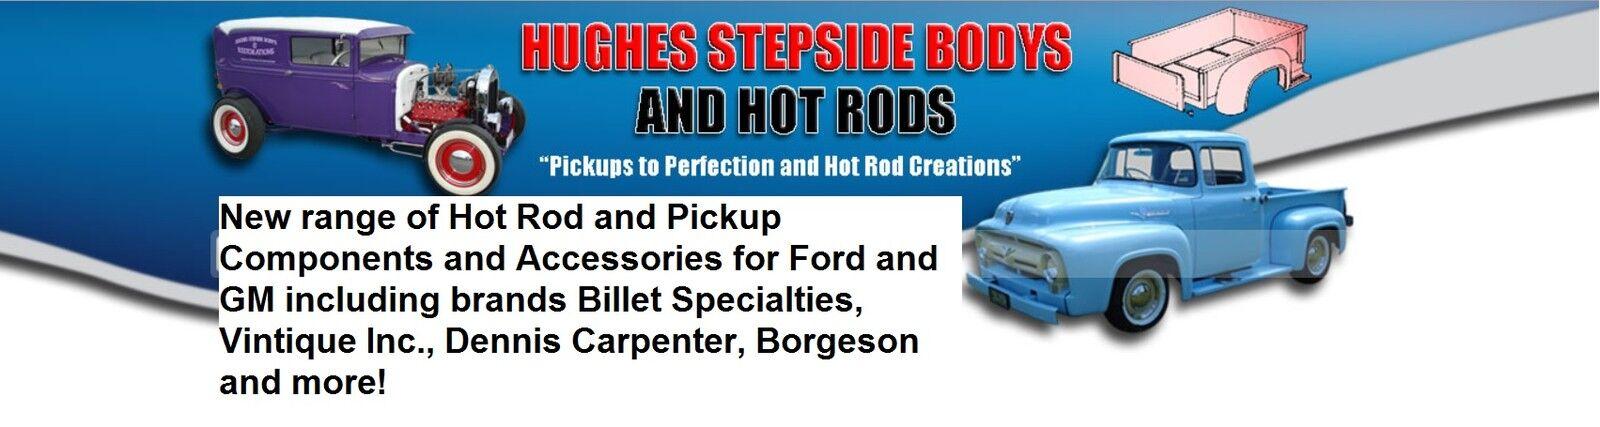 Hughes Stepside Bodys online